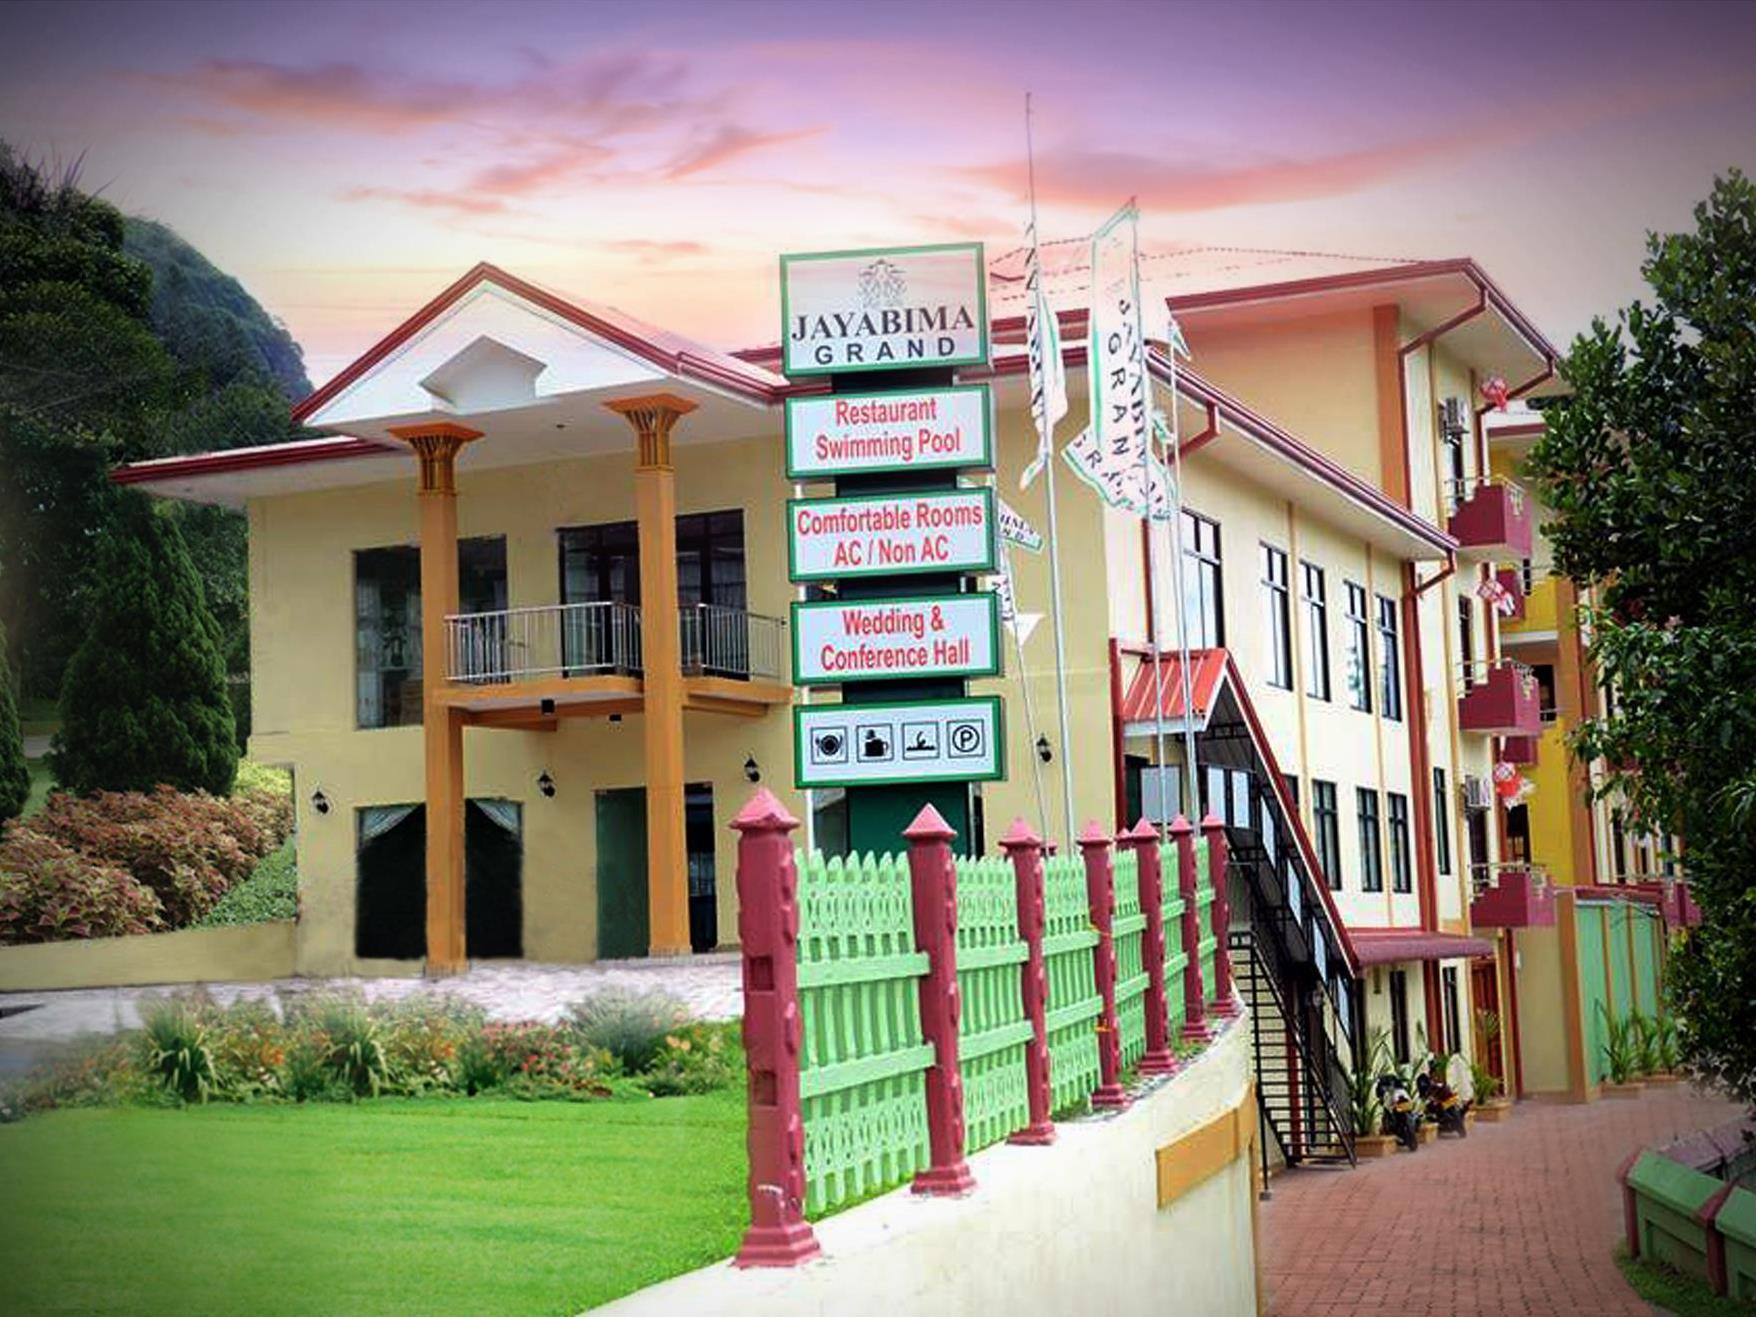 Jayabima Grand Hotel